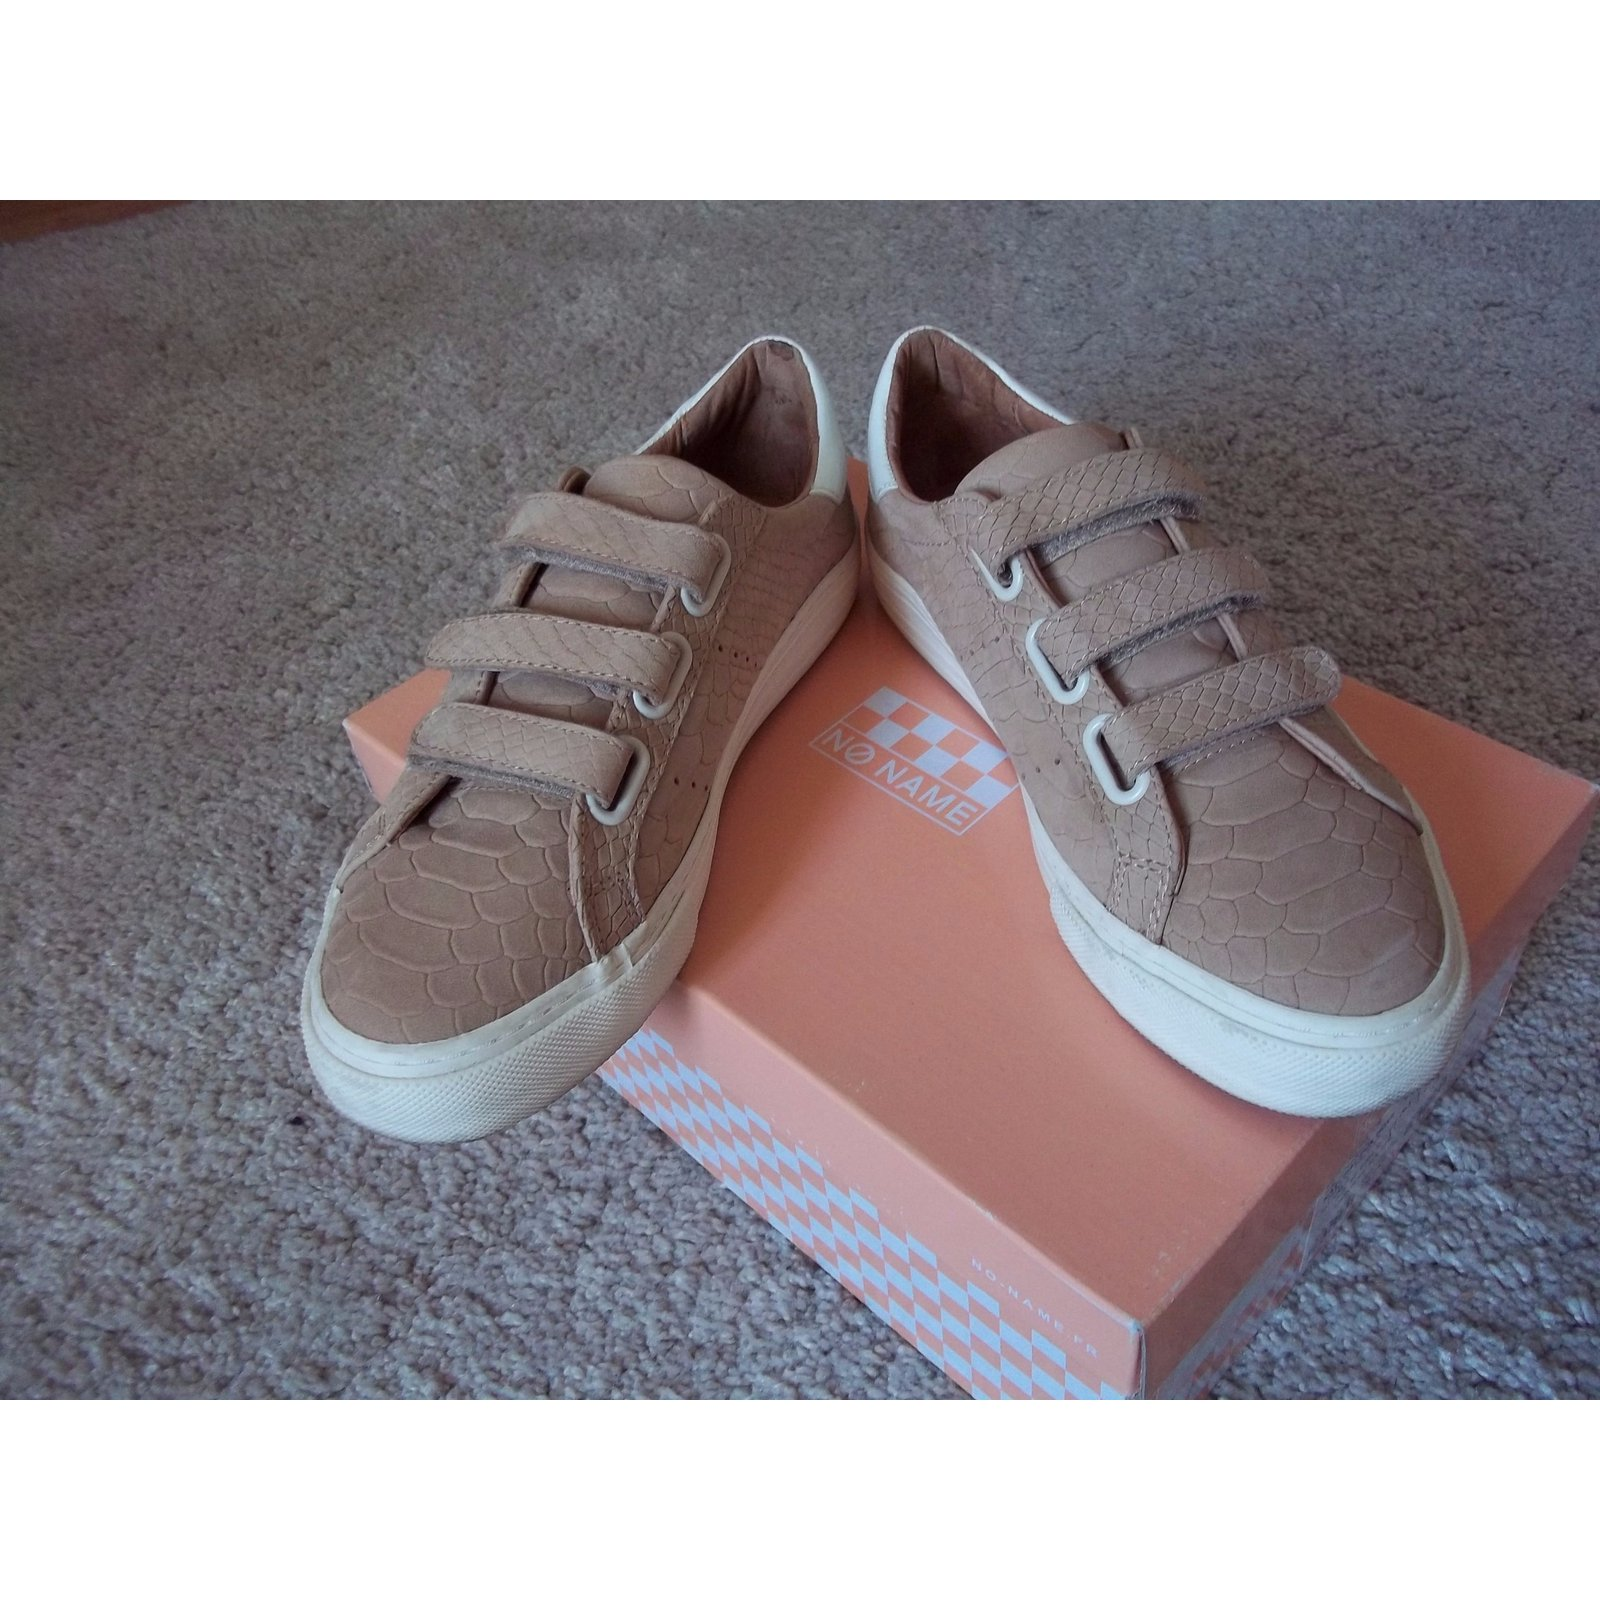 No Name Arcade Velcro Sneakers Sneakers